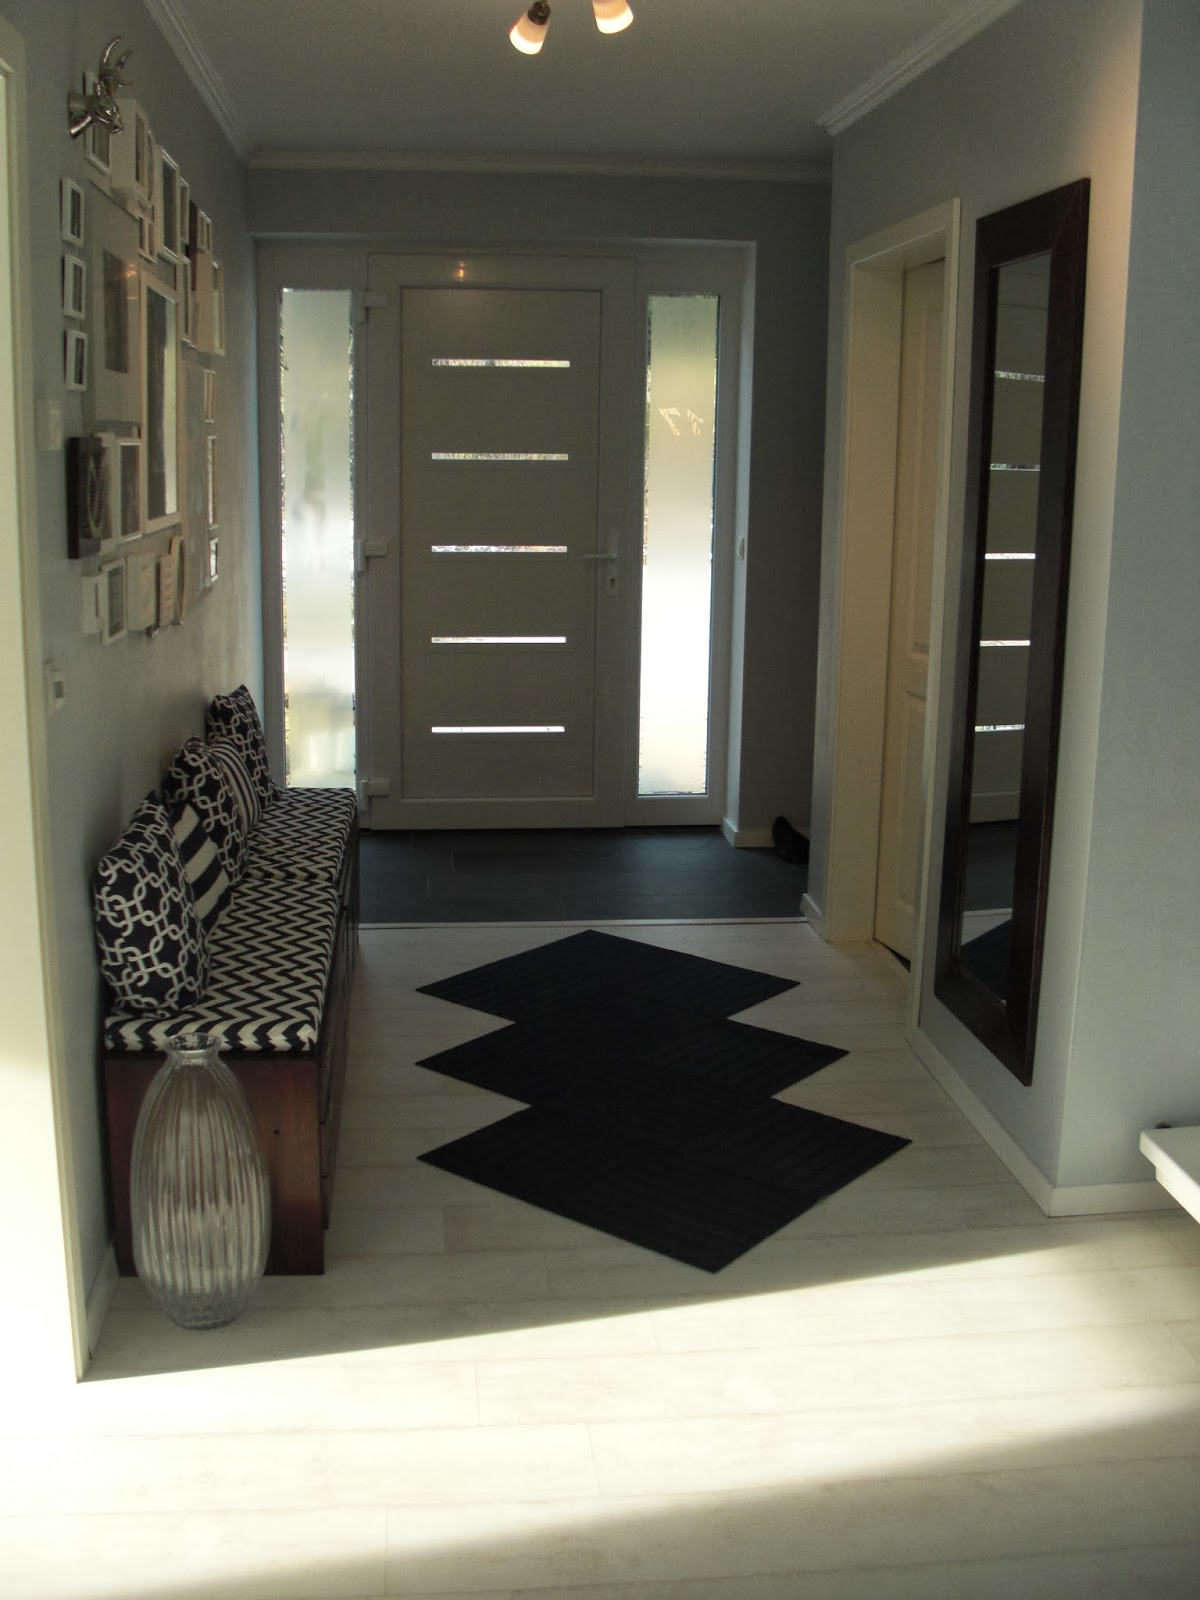 teppich flur haus deko ideen. Black Bedroom Furniture Sets. Home Design Ideas